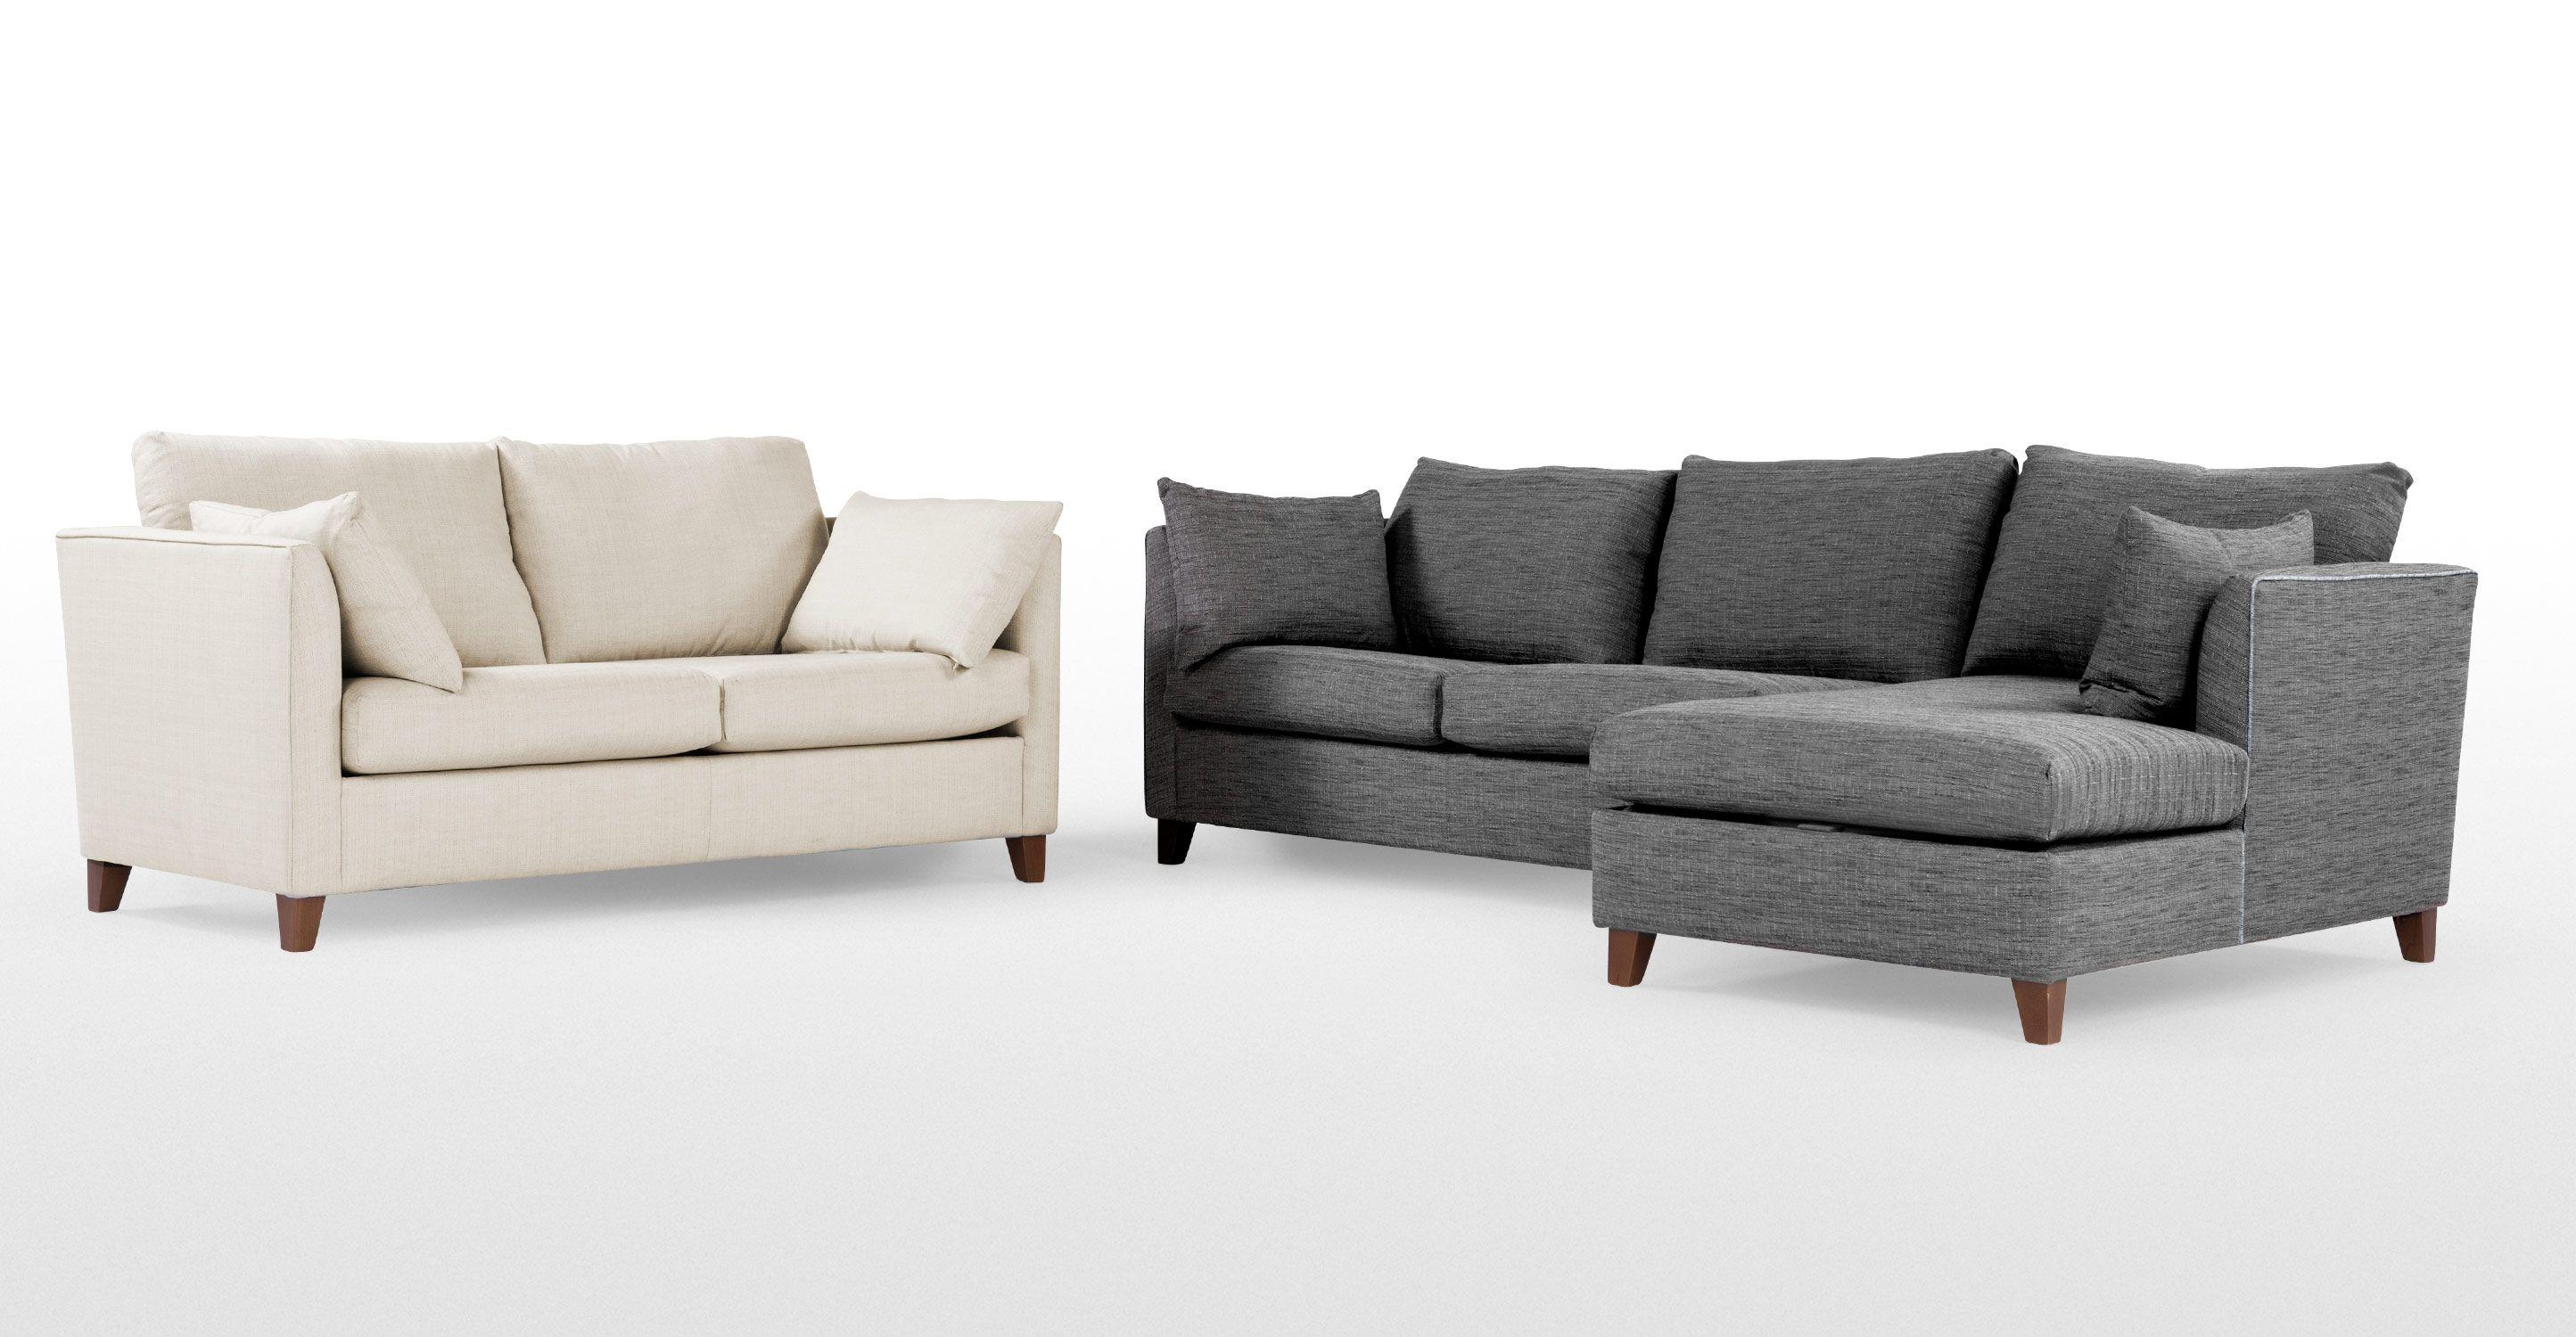 Bari Corner Storage Sofabed, Right Hand Facing, Malva